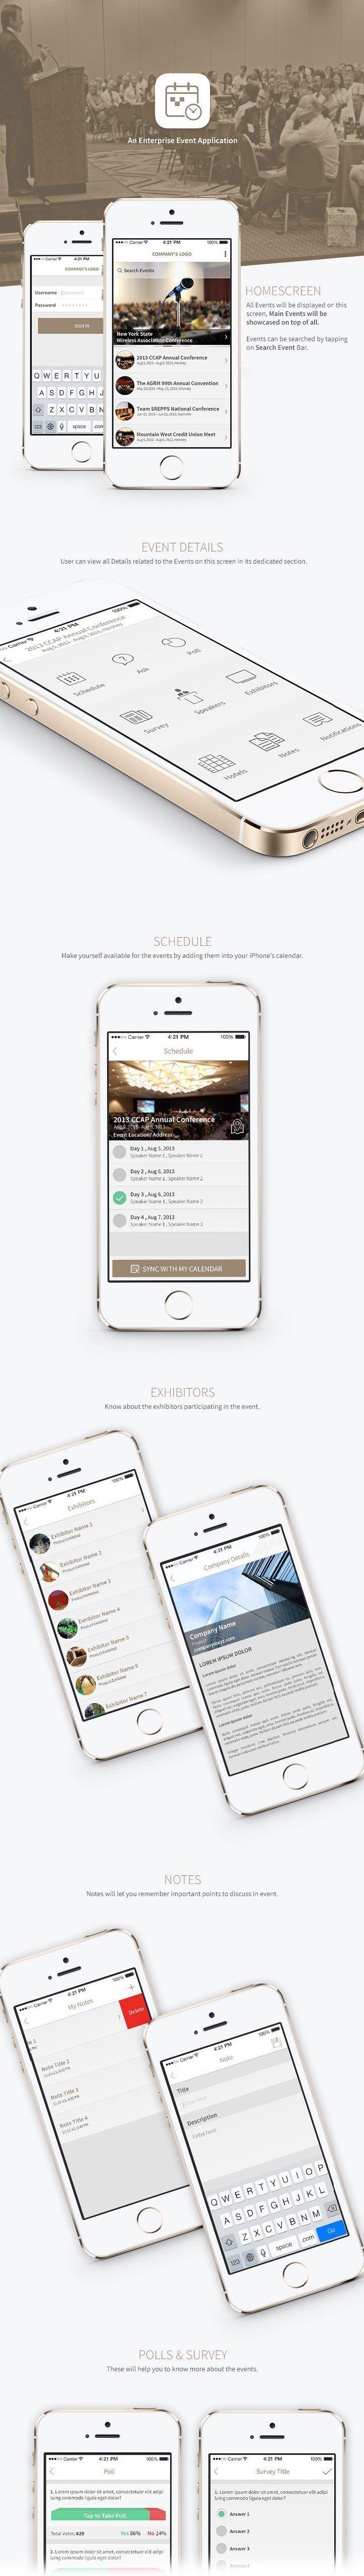 An Enterprise Event App